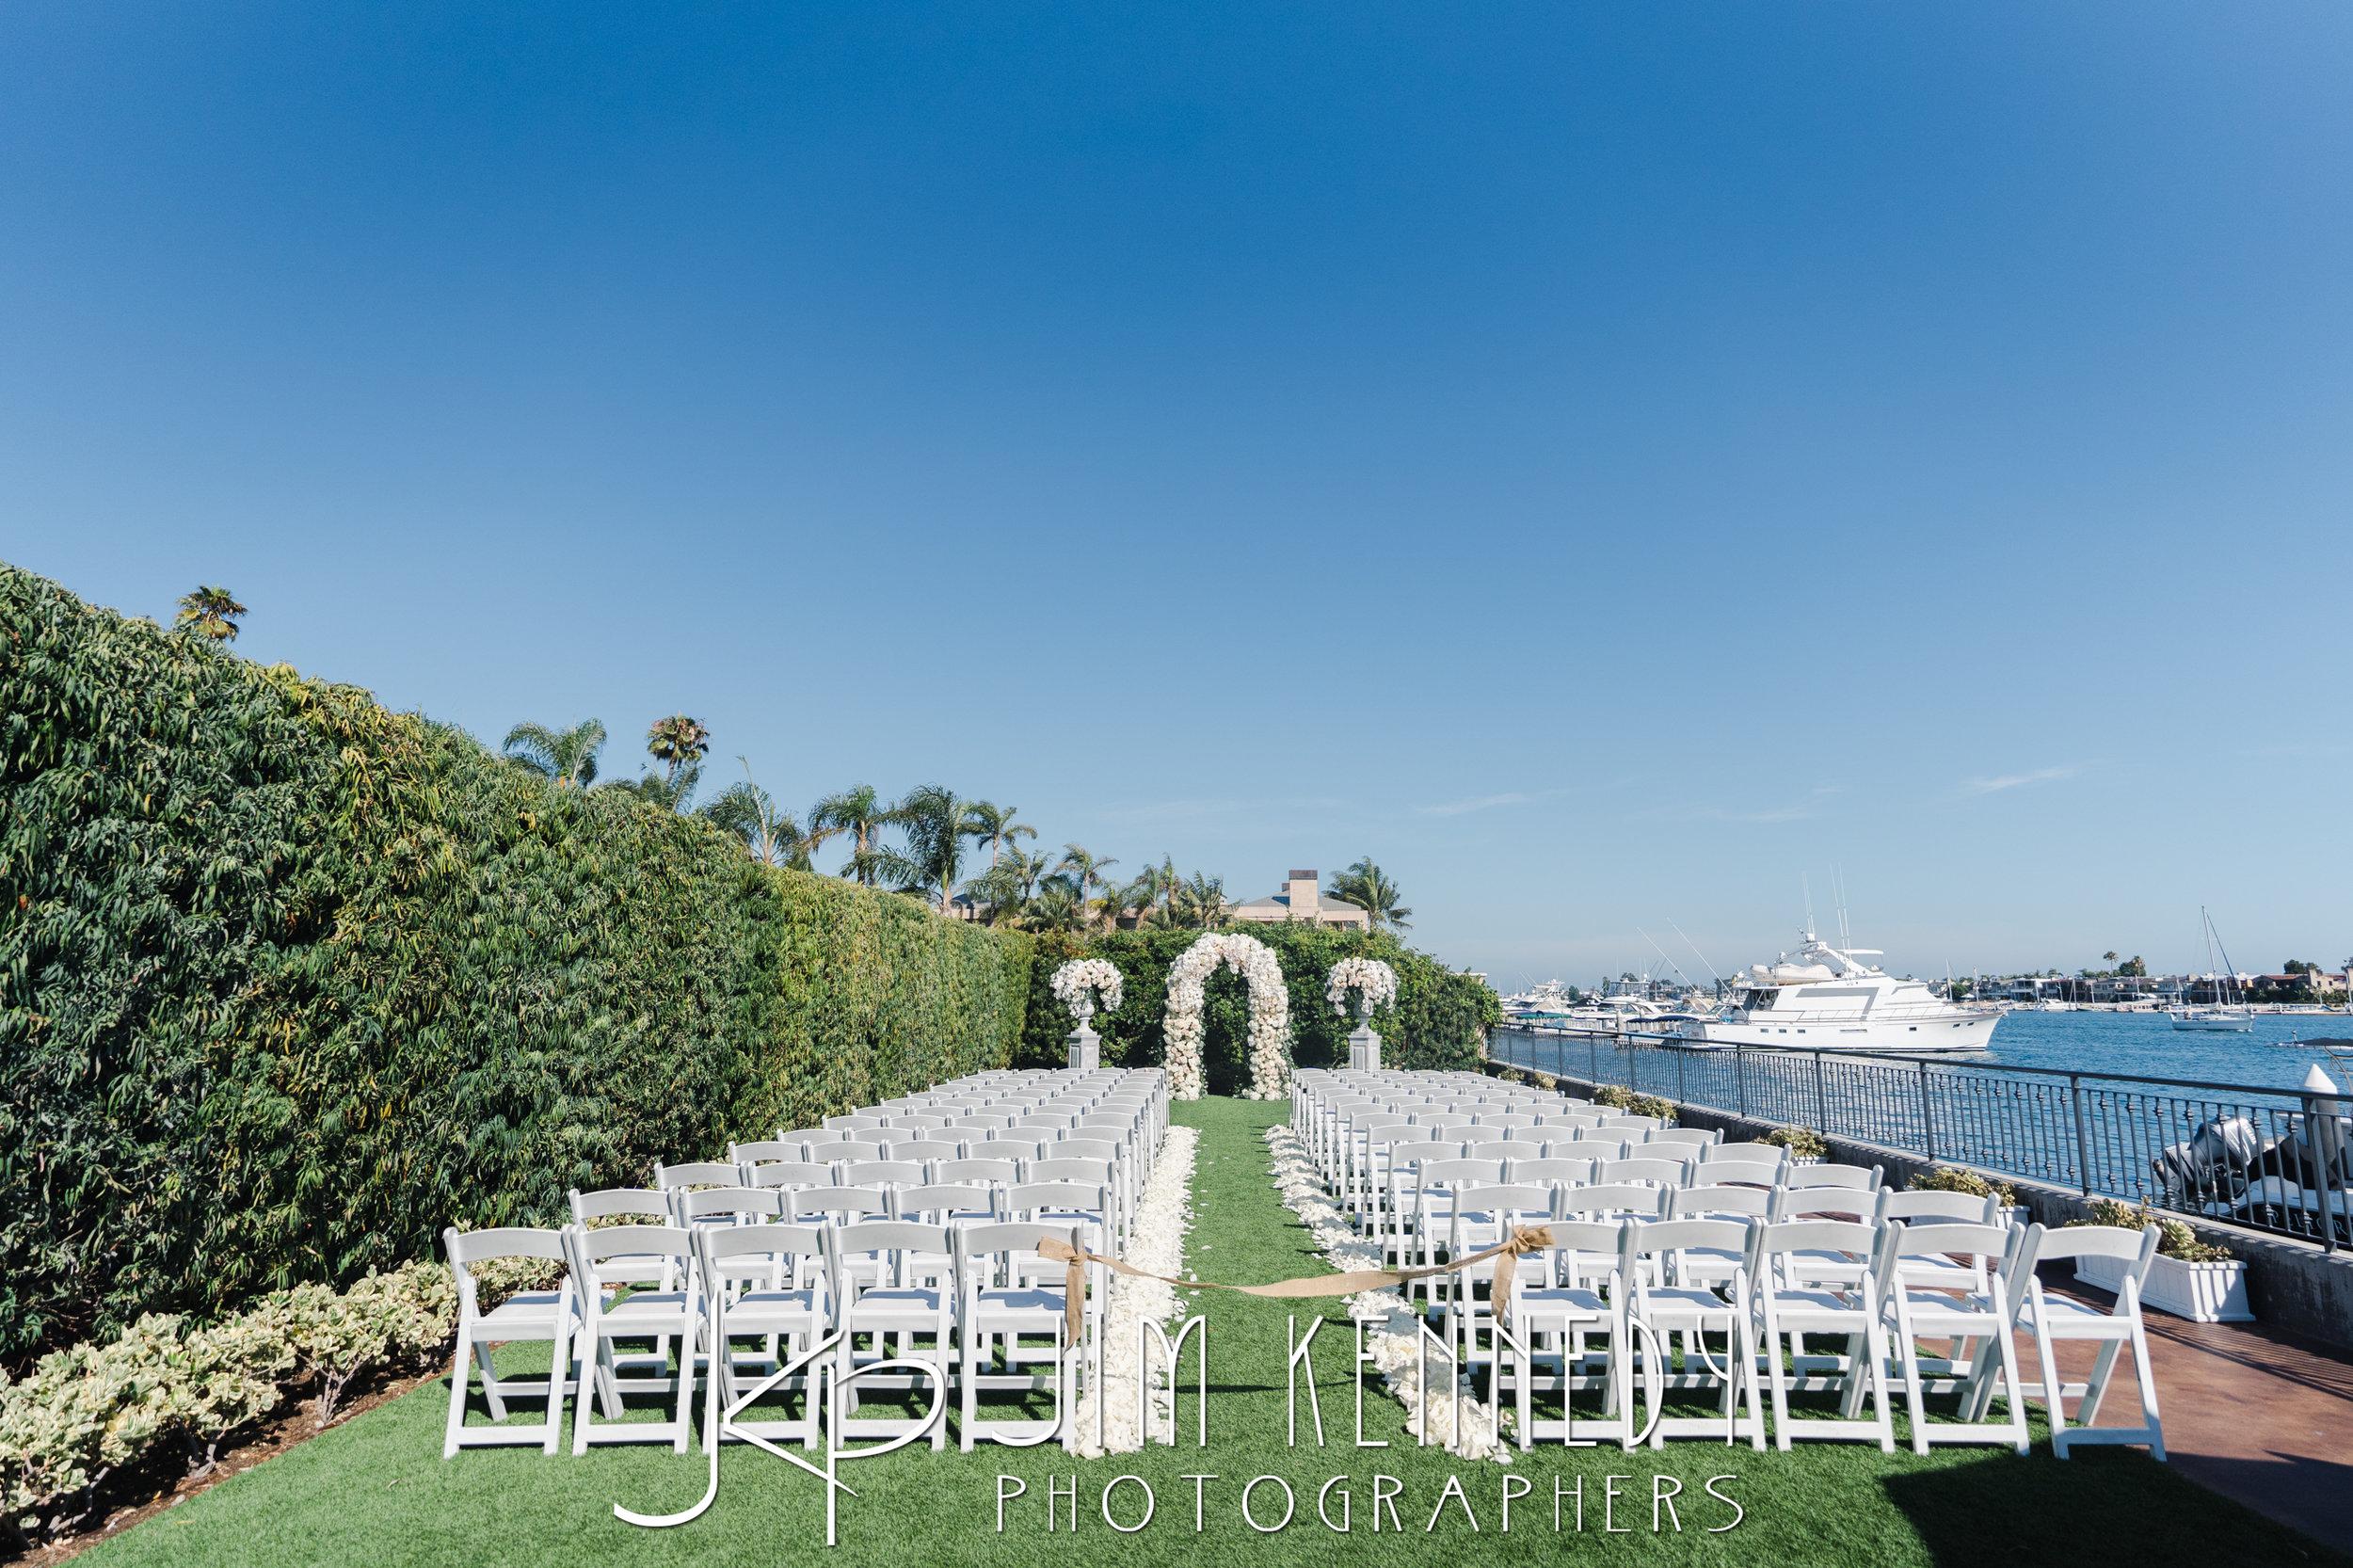 balboa-bay-resort-wedding-brooke-kevin_0080.JPG